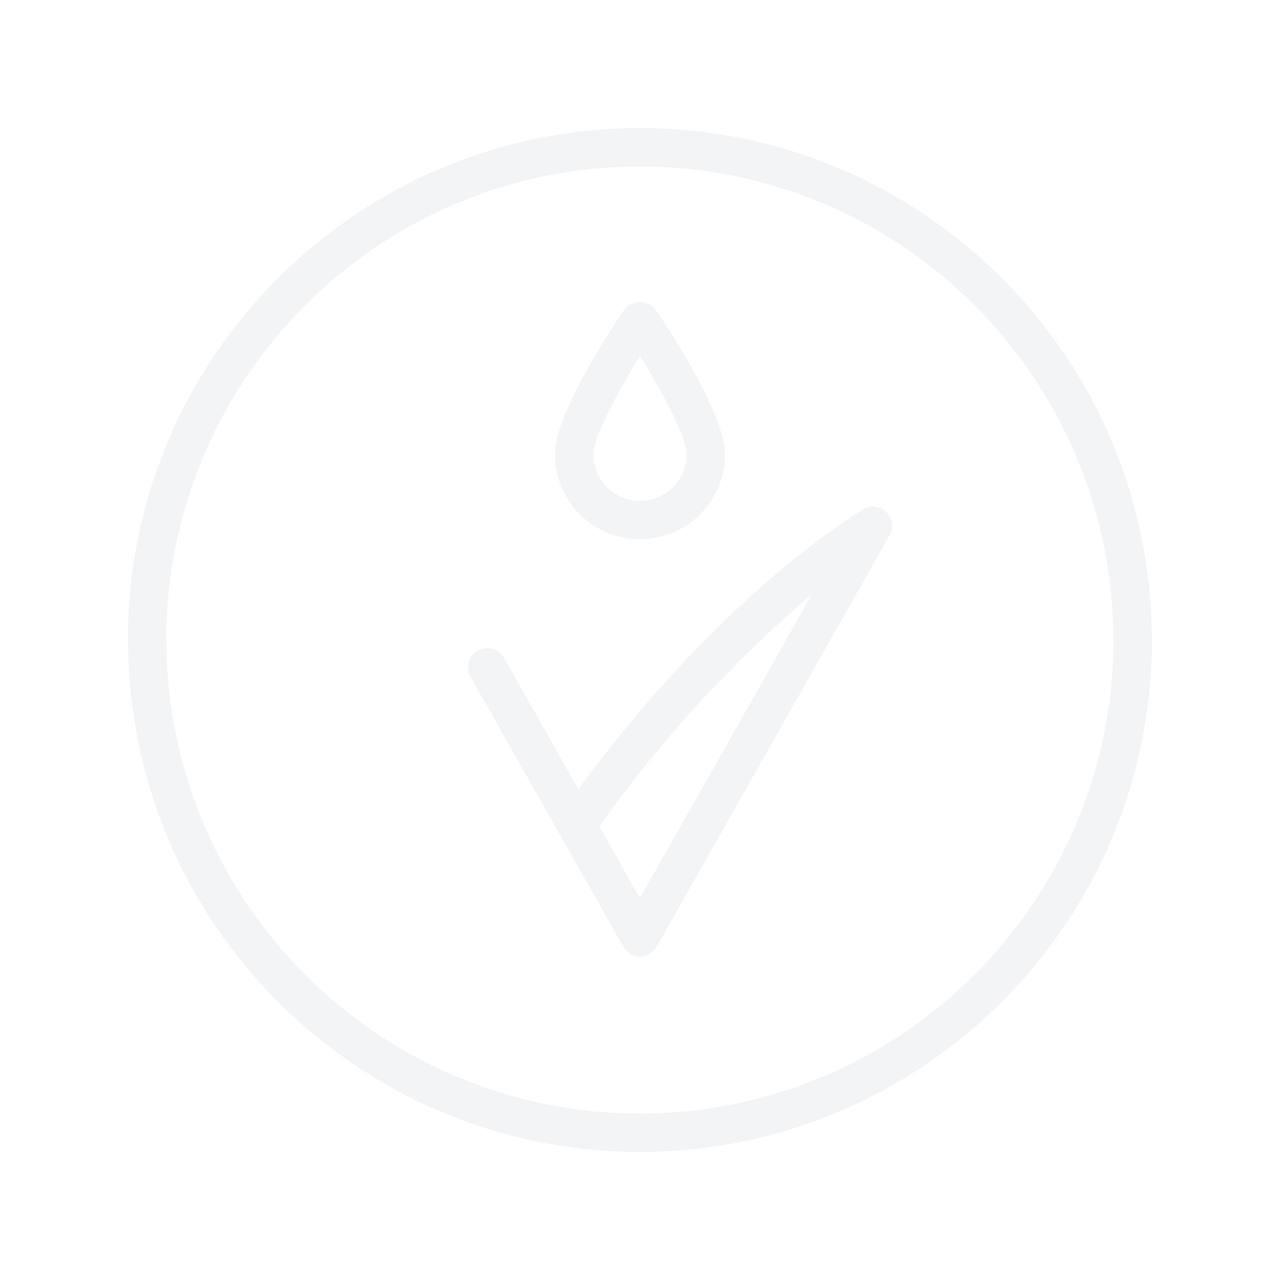 ESTEE LAUDER Double Wear Nude Makeup SPF30 30ml